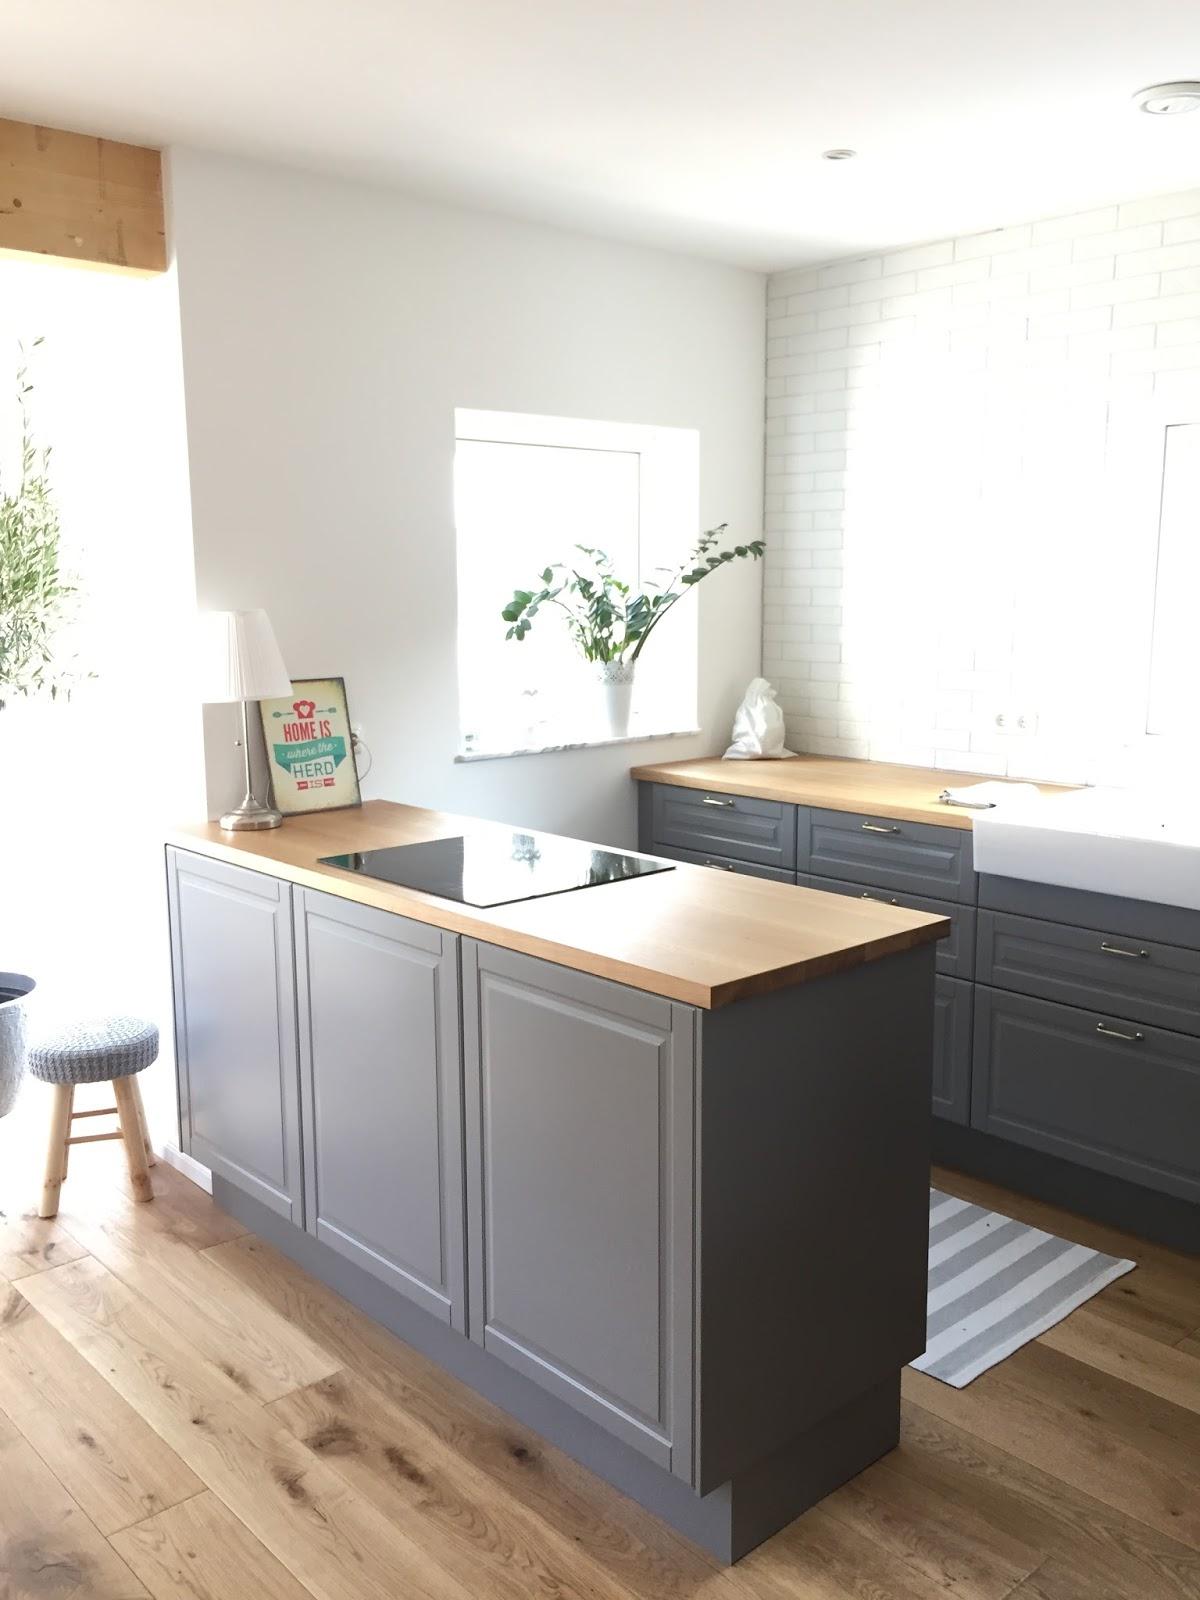 it 39 s jess kleine f hrung teil 2 unsere vorurteilsbeladene k che vom m belschweden. Black Bedroom Furniture Sets. Home Design Ideas